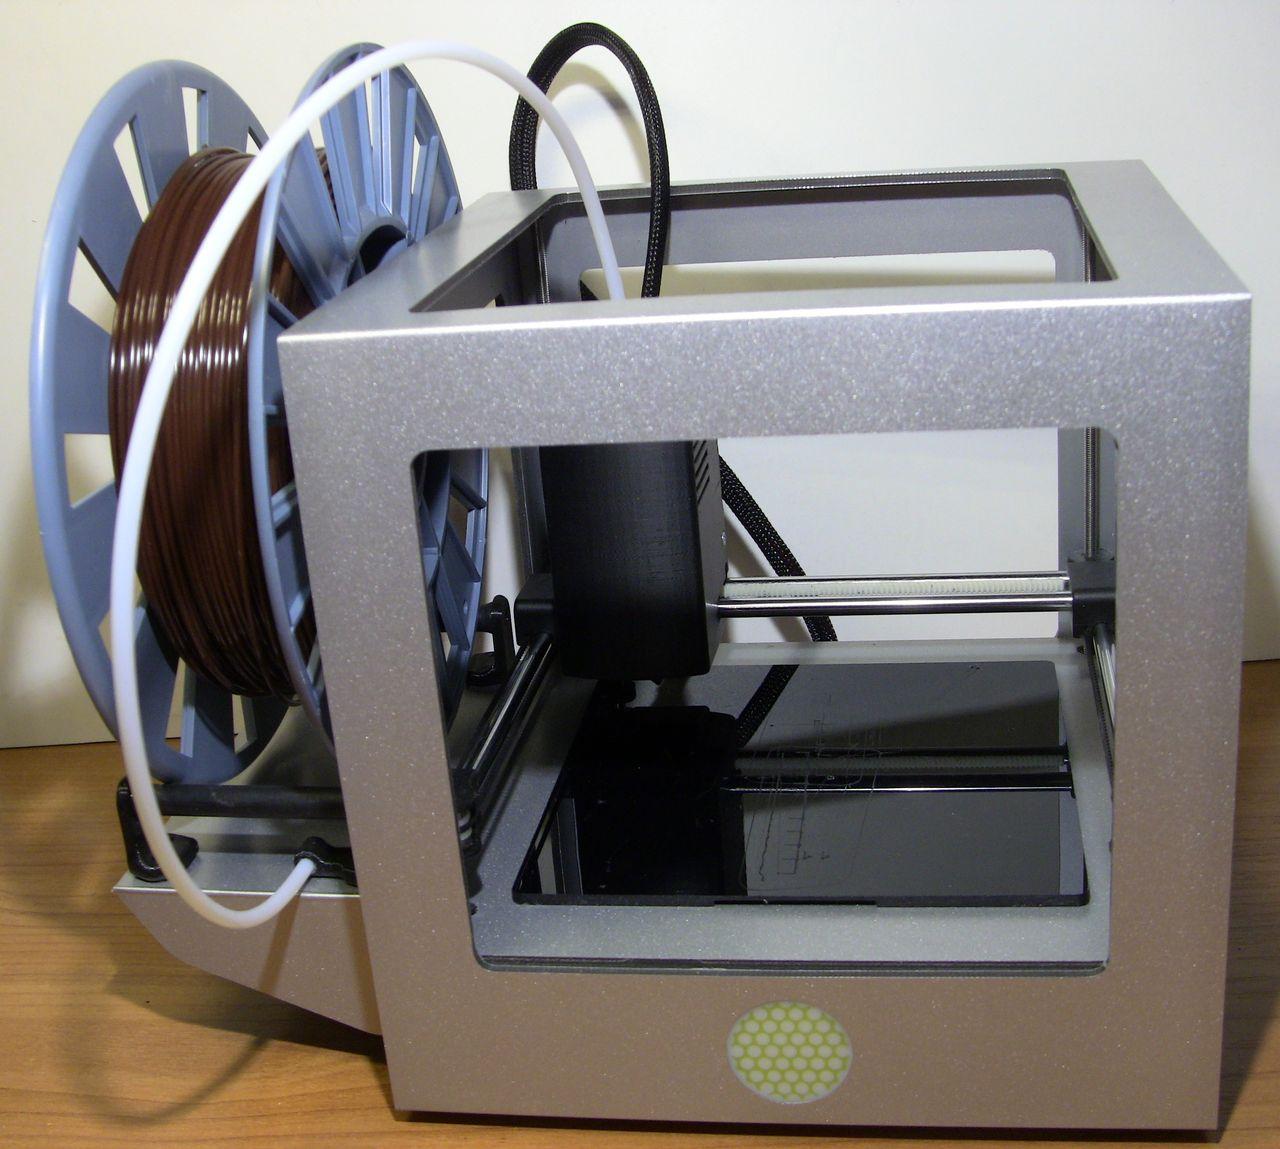 Обзор. Корпус 3D принтера Cactus Micro C1